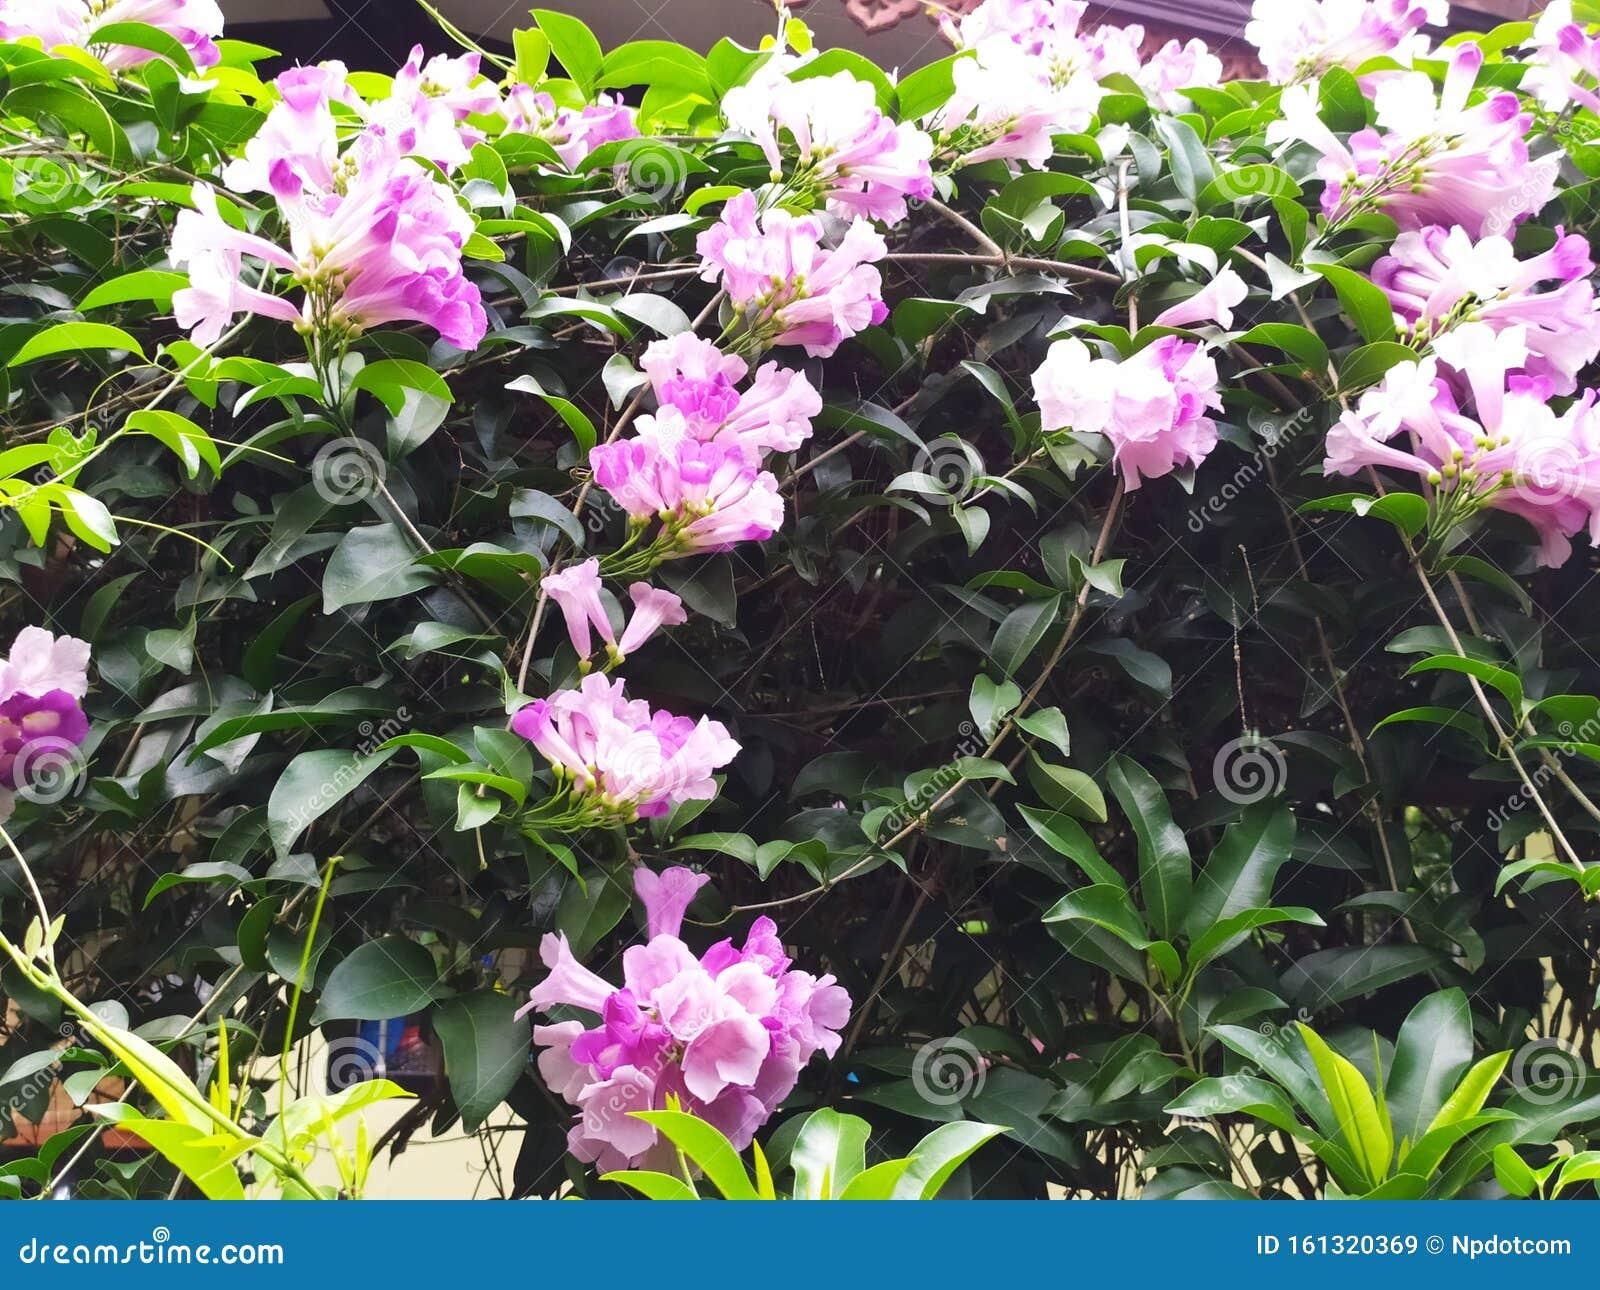 Image result for BEAUTIFUL FRAGRANT FLOWER GARDEN THAILAND